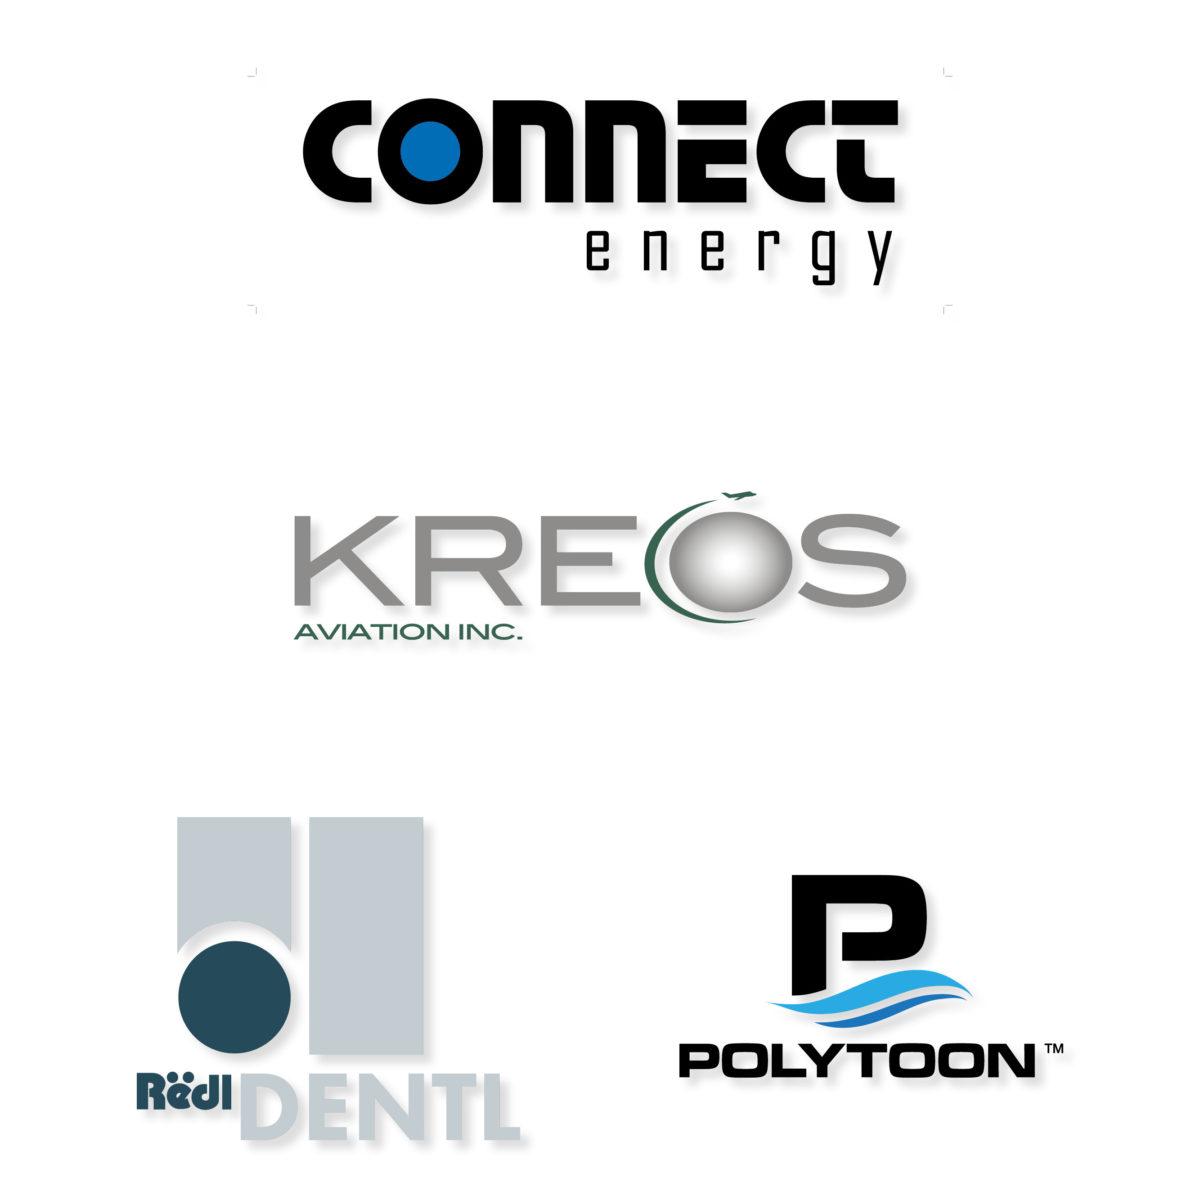 http://terracommunications.ca/wp-content/uploads/2018/02/Logos-e1519753910953.jpg